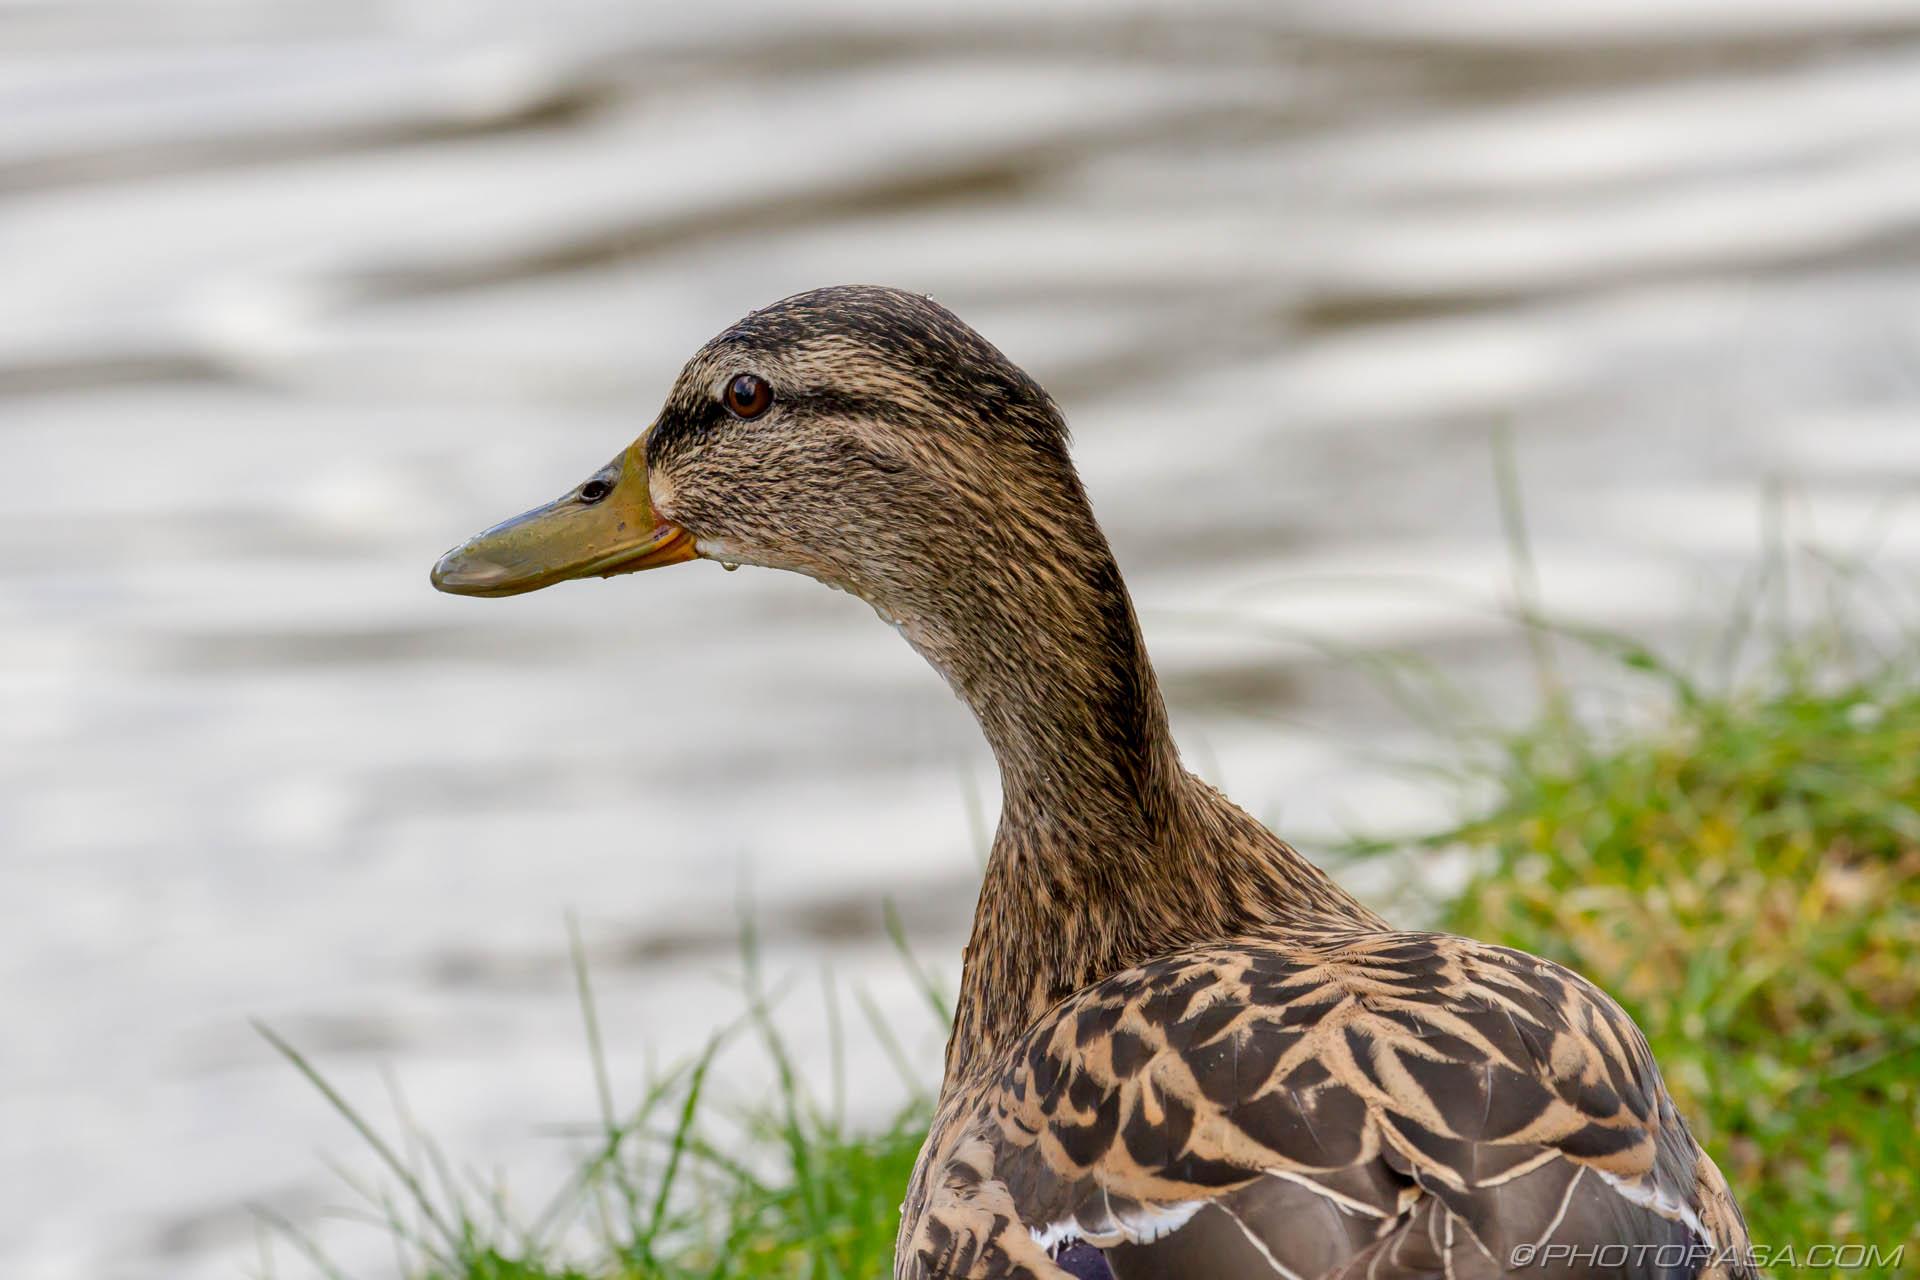 https://photorasa.com/mallard-ducks/close-up-of-female-mallard-next-to-water/